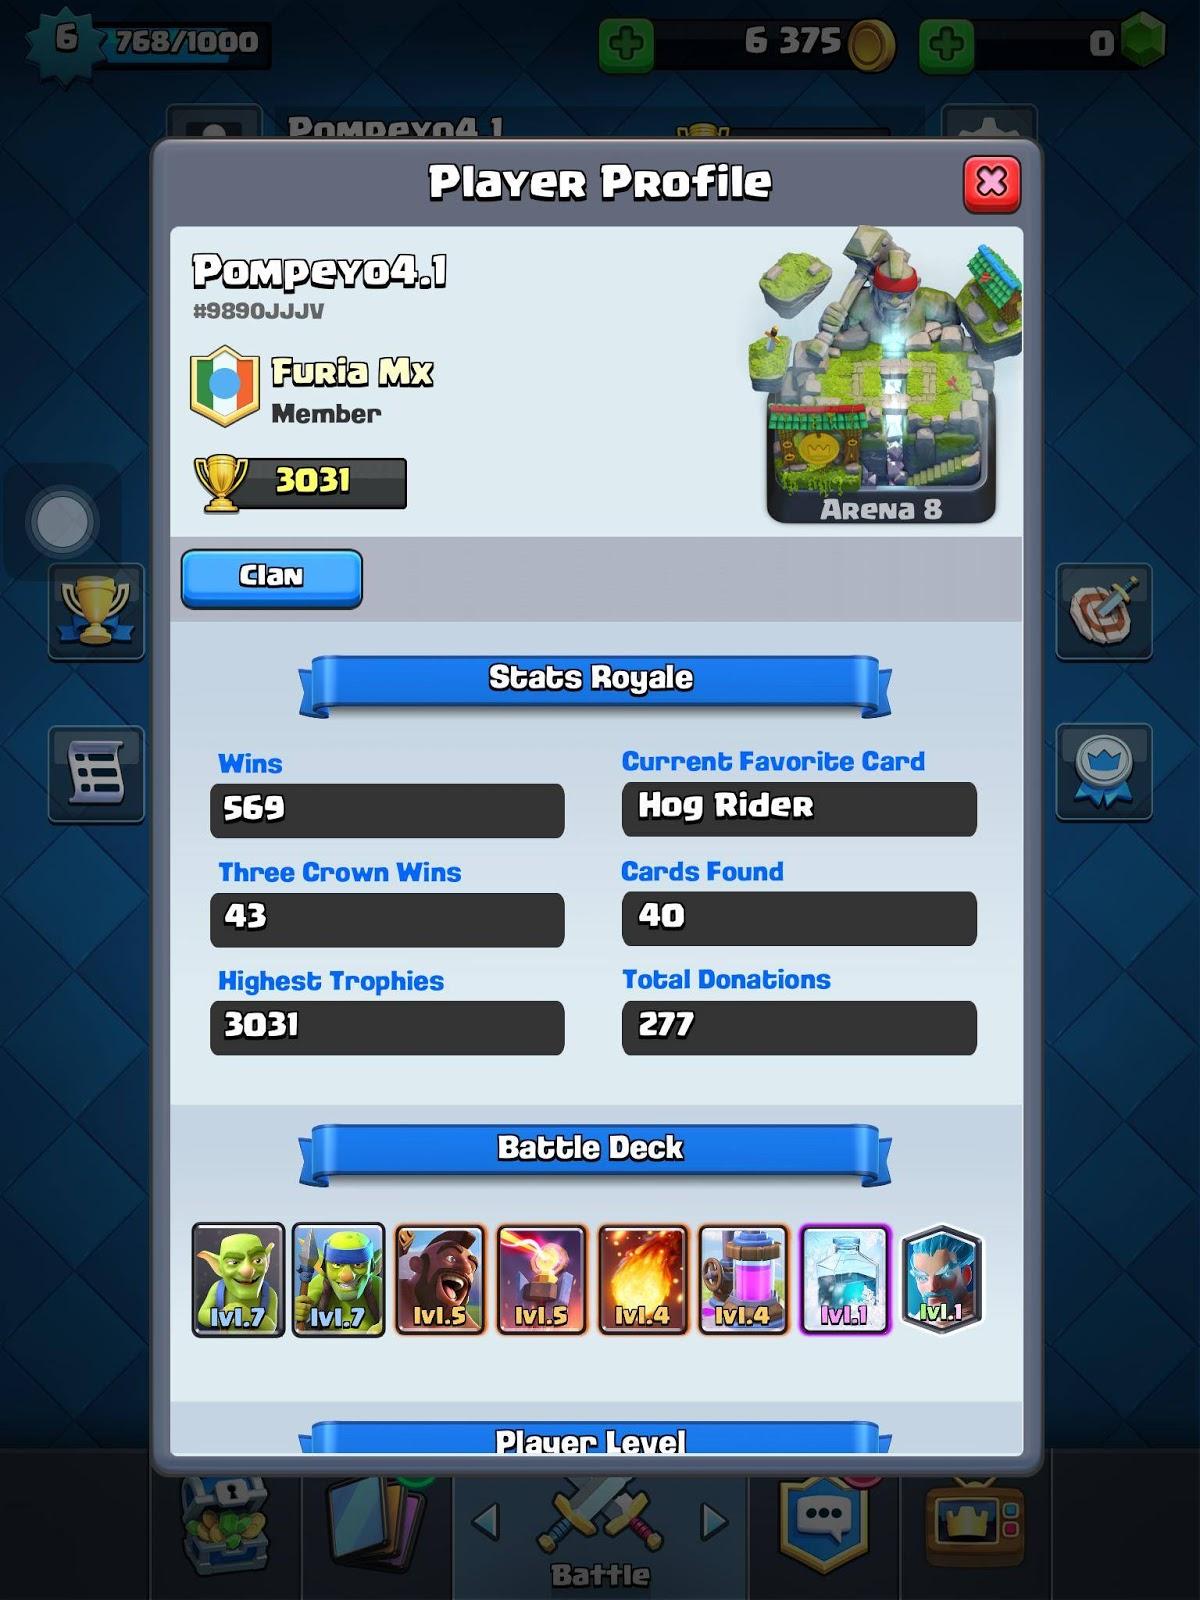 pompeyo4.1 clashroyale legendary deck